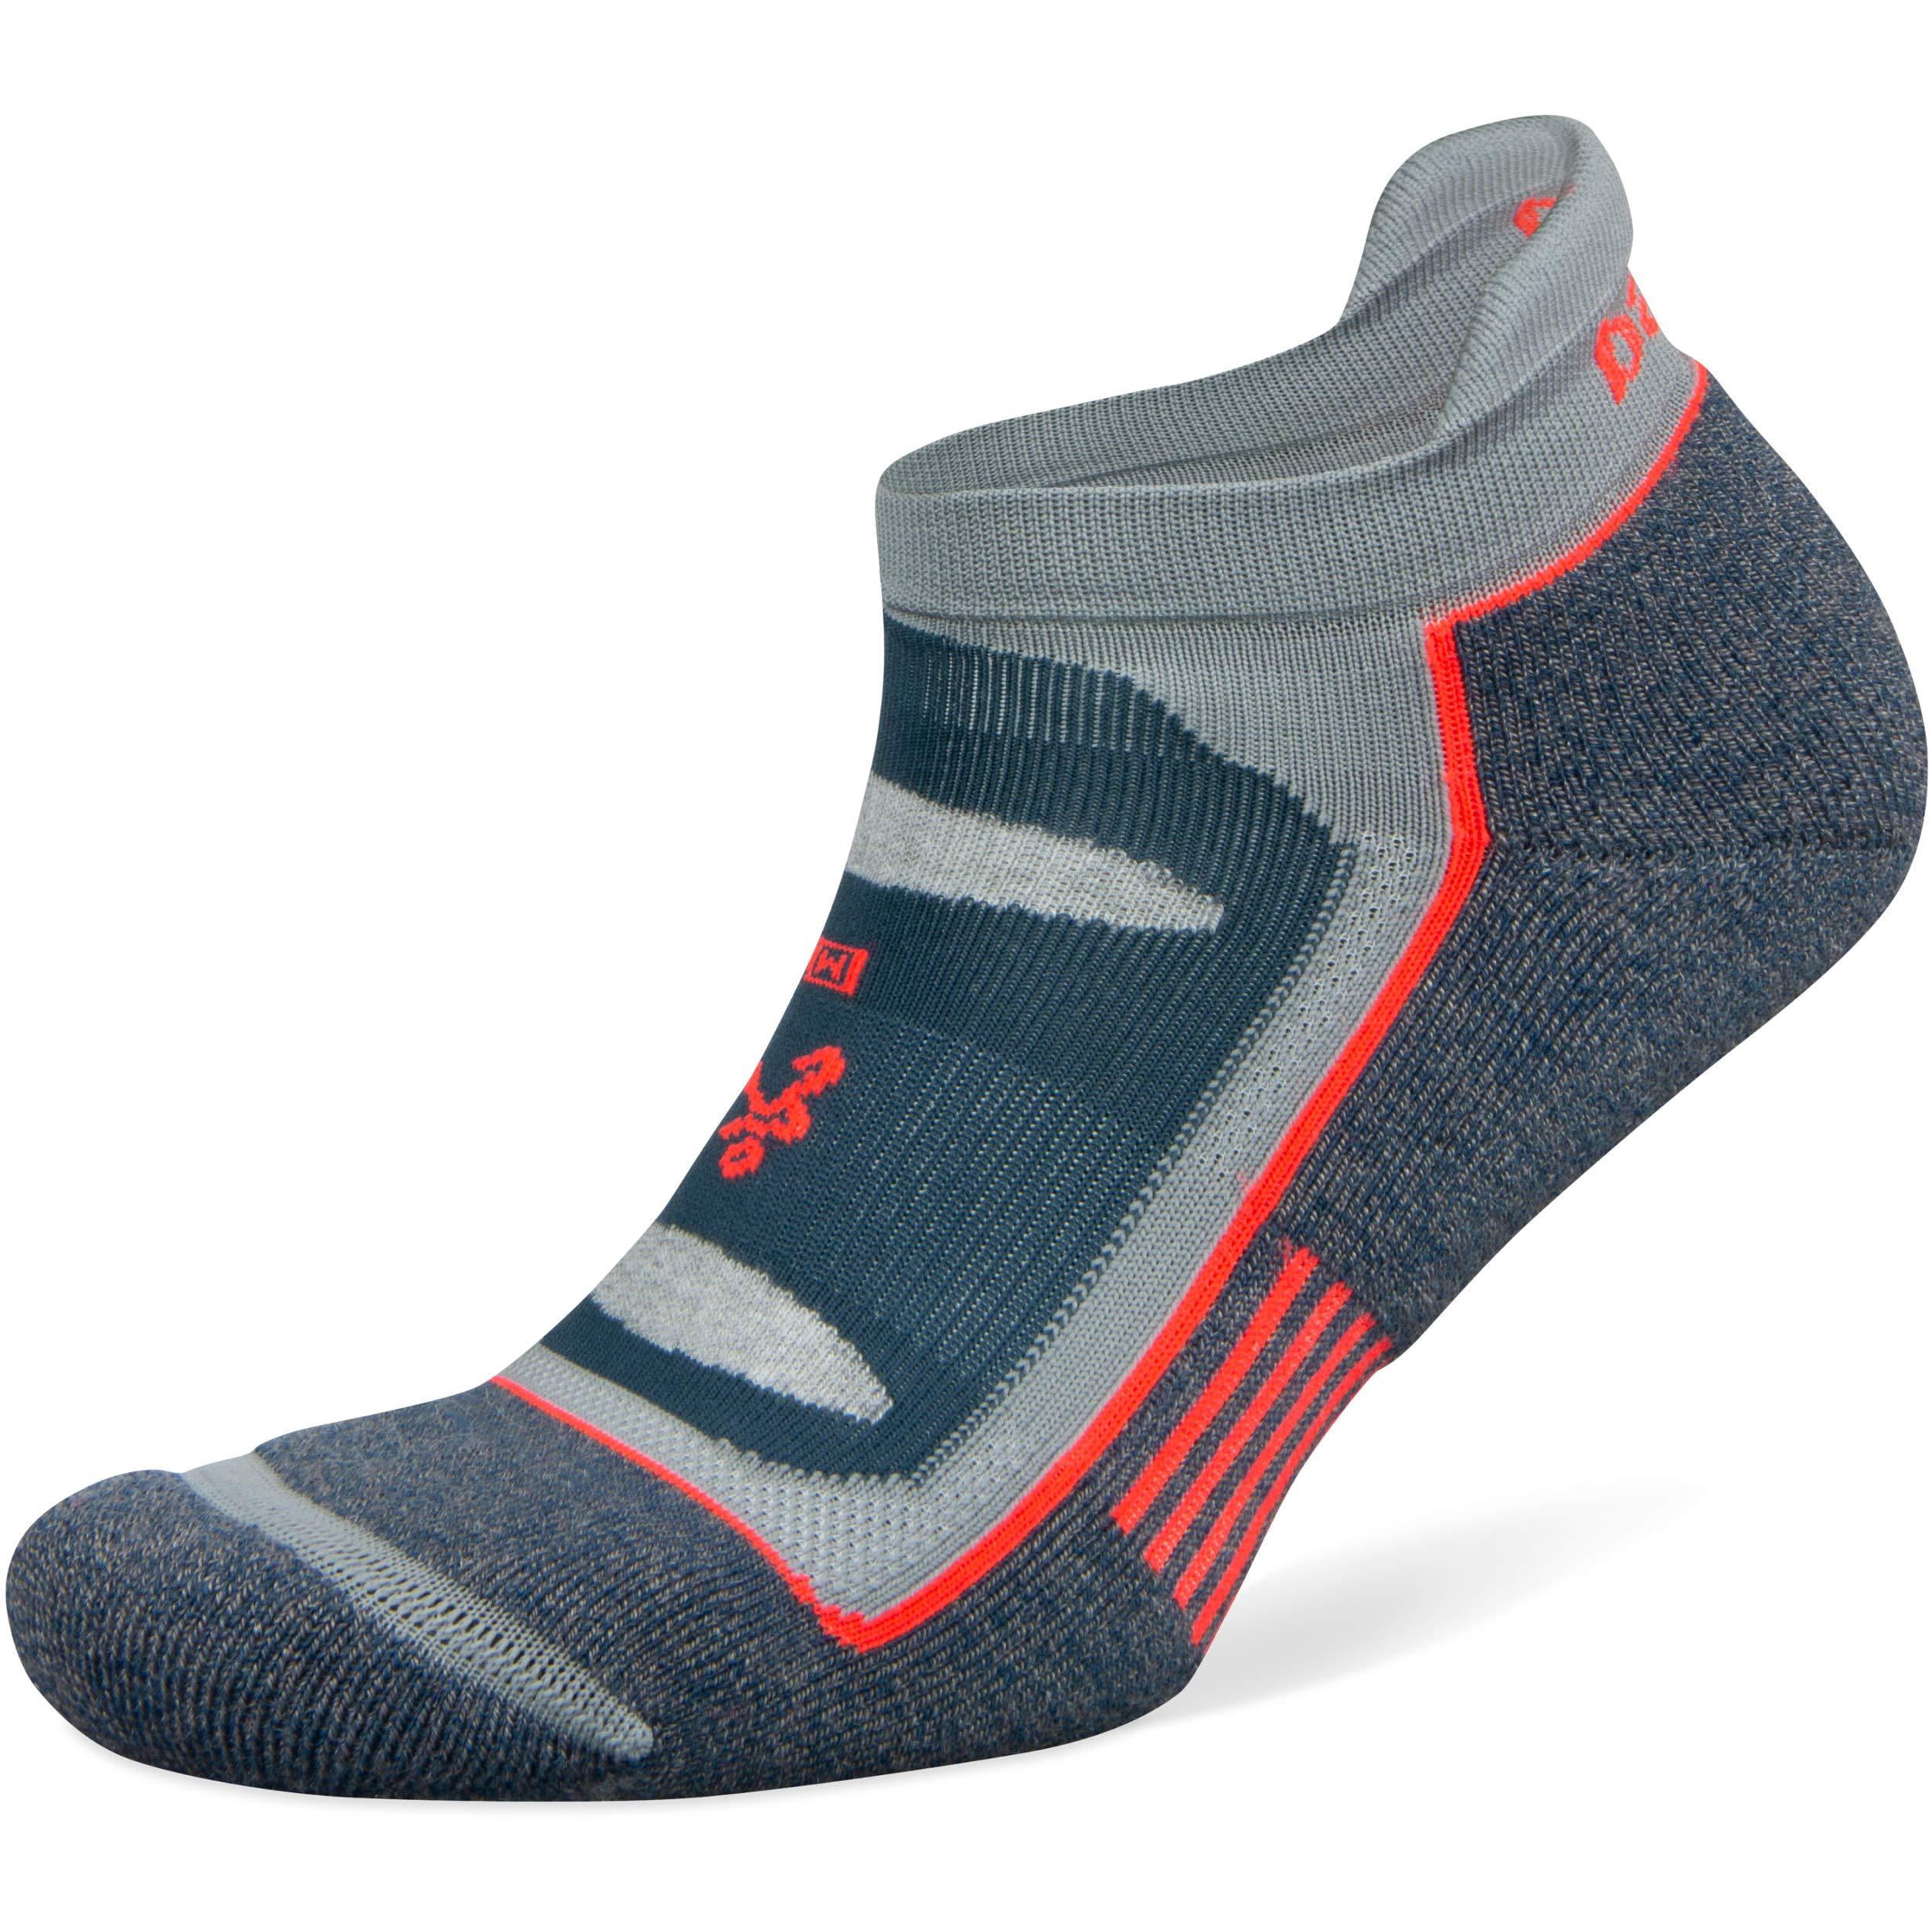 Balega Blister Resist No Show Socks for Men and Women (1 Pair), Legion Blue/Grey, Small by Balega